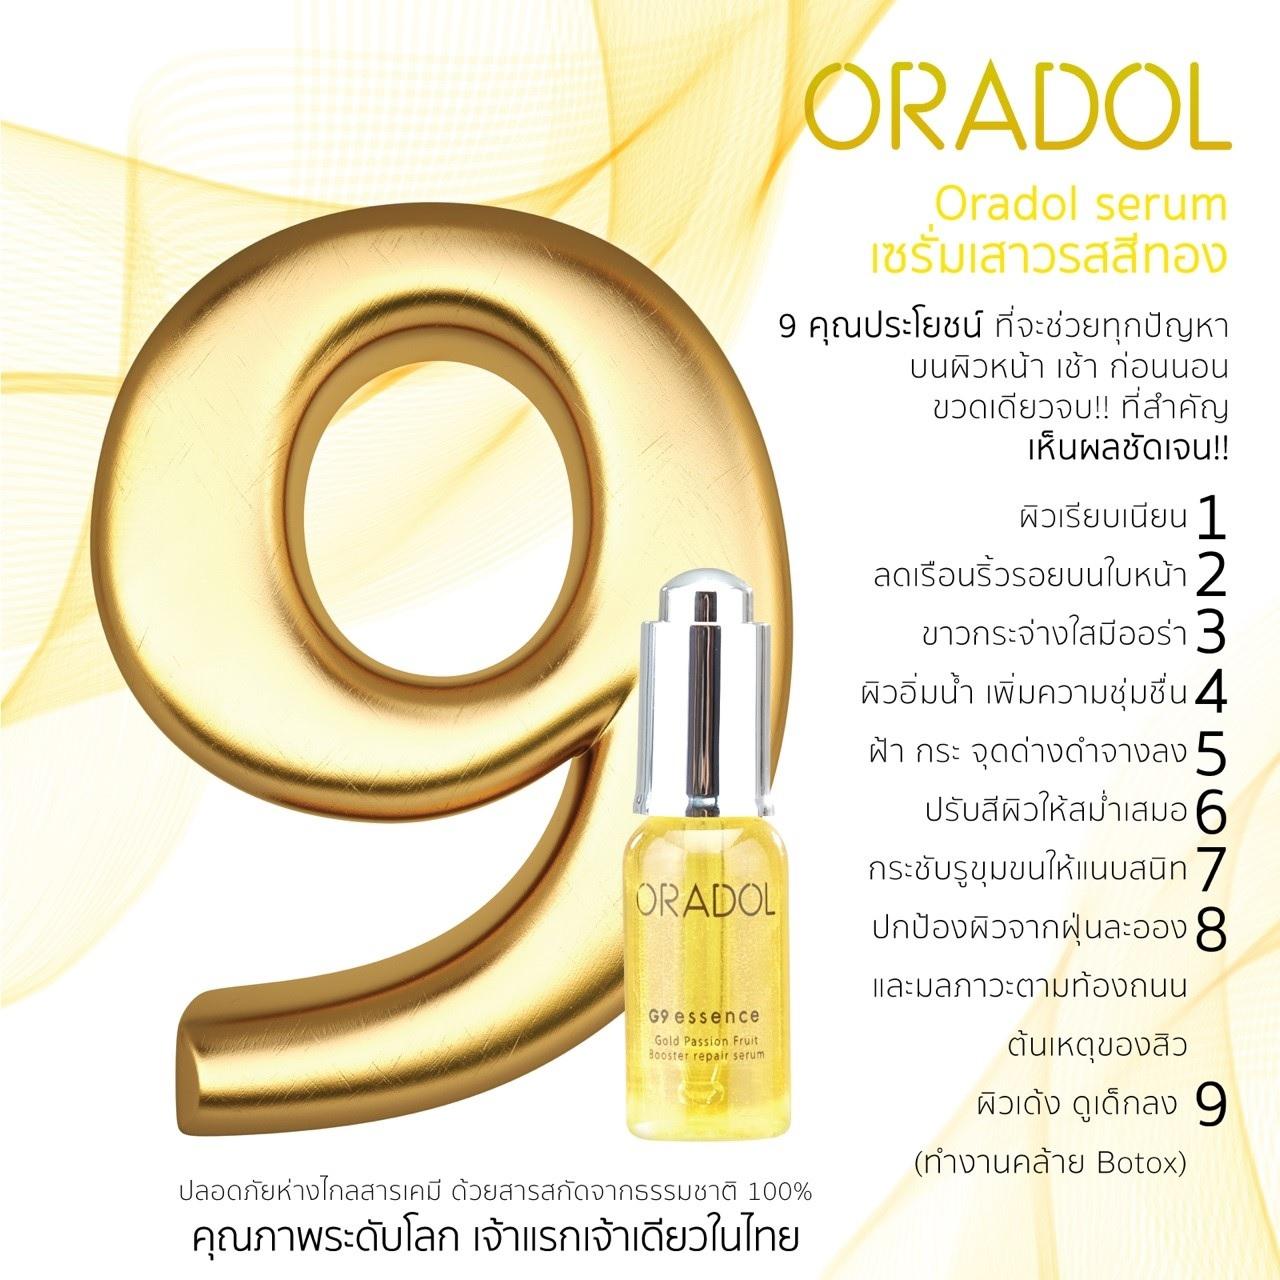 Oradol G9 Essence serum ช่วยเรื่องอะไร